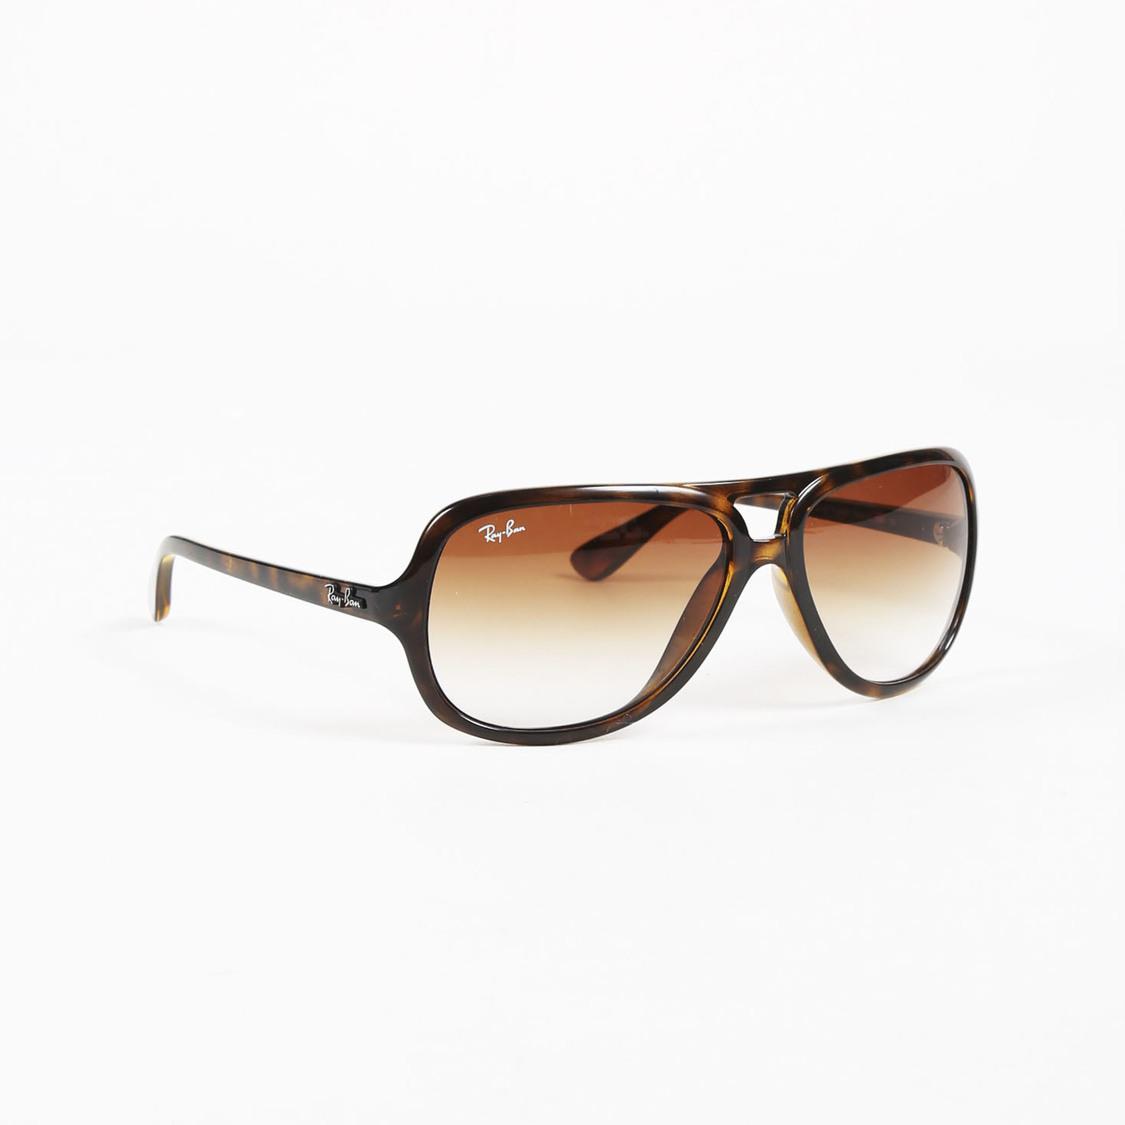 1b326e7bfe ... sweden ray ban. womens brown shield rb4162 sunglasses 93bdd 28c53